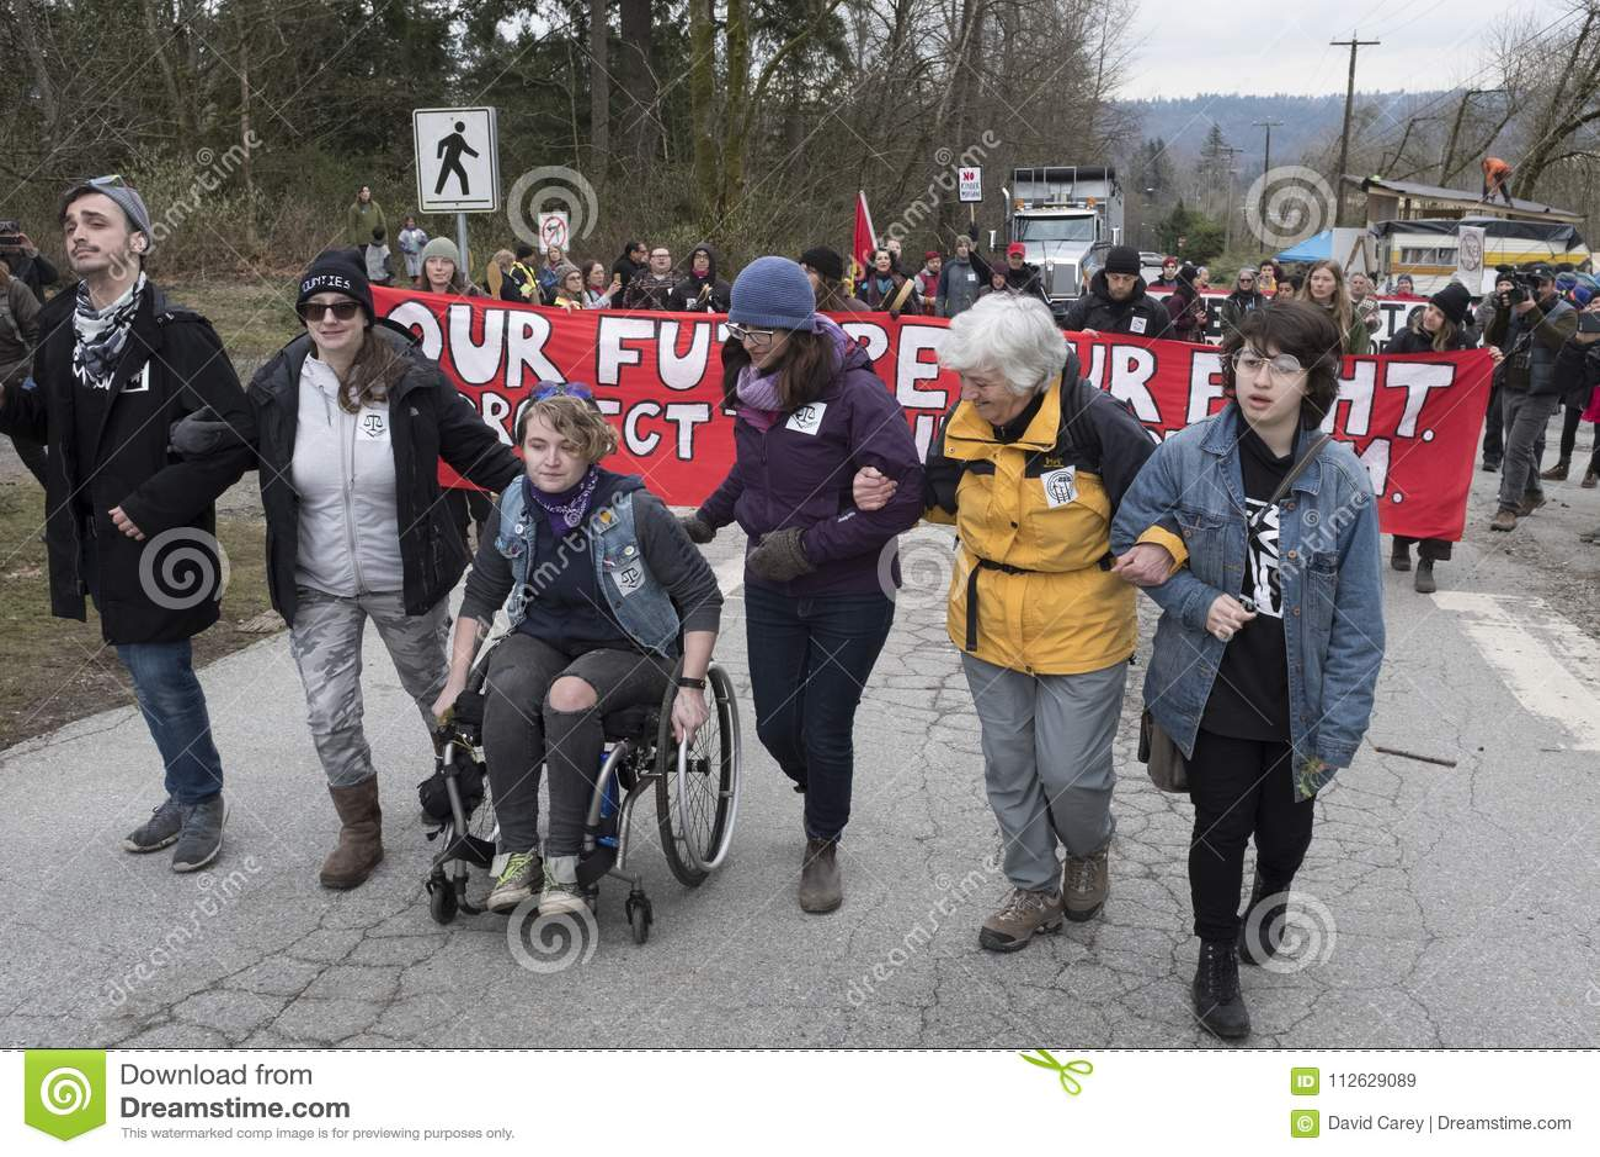 Protesters at the Kinder Morgan tank farm in Burnaby, BC